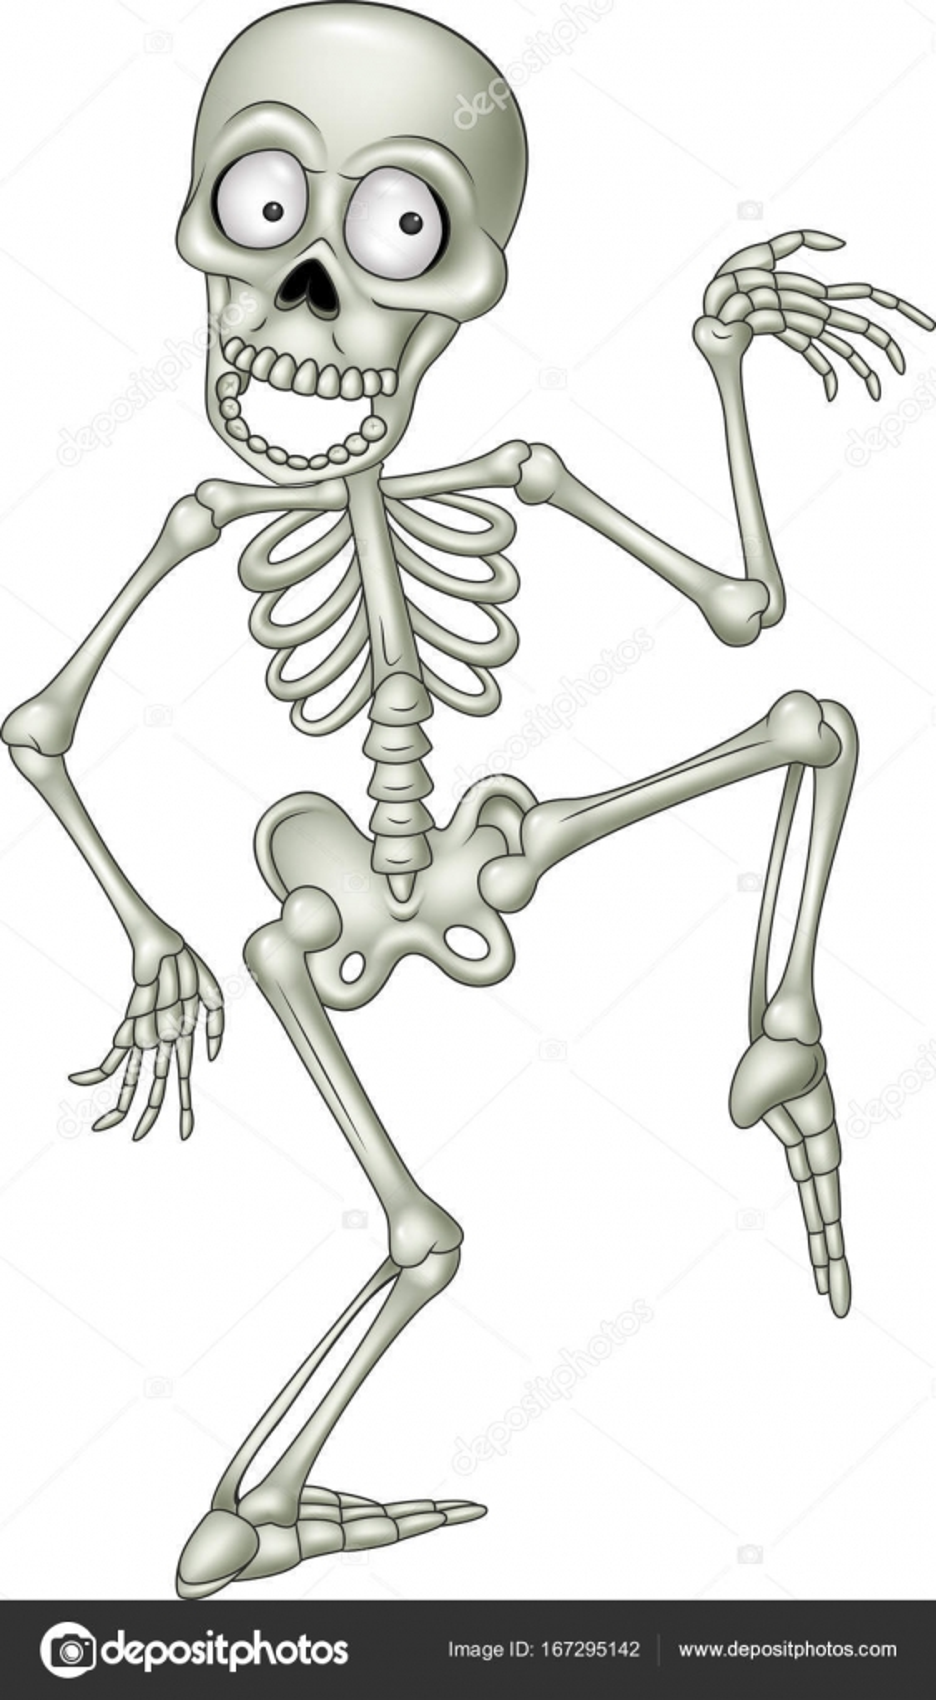 Esqueleto humano divertido dibujos animados bailando — Vector de ...